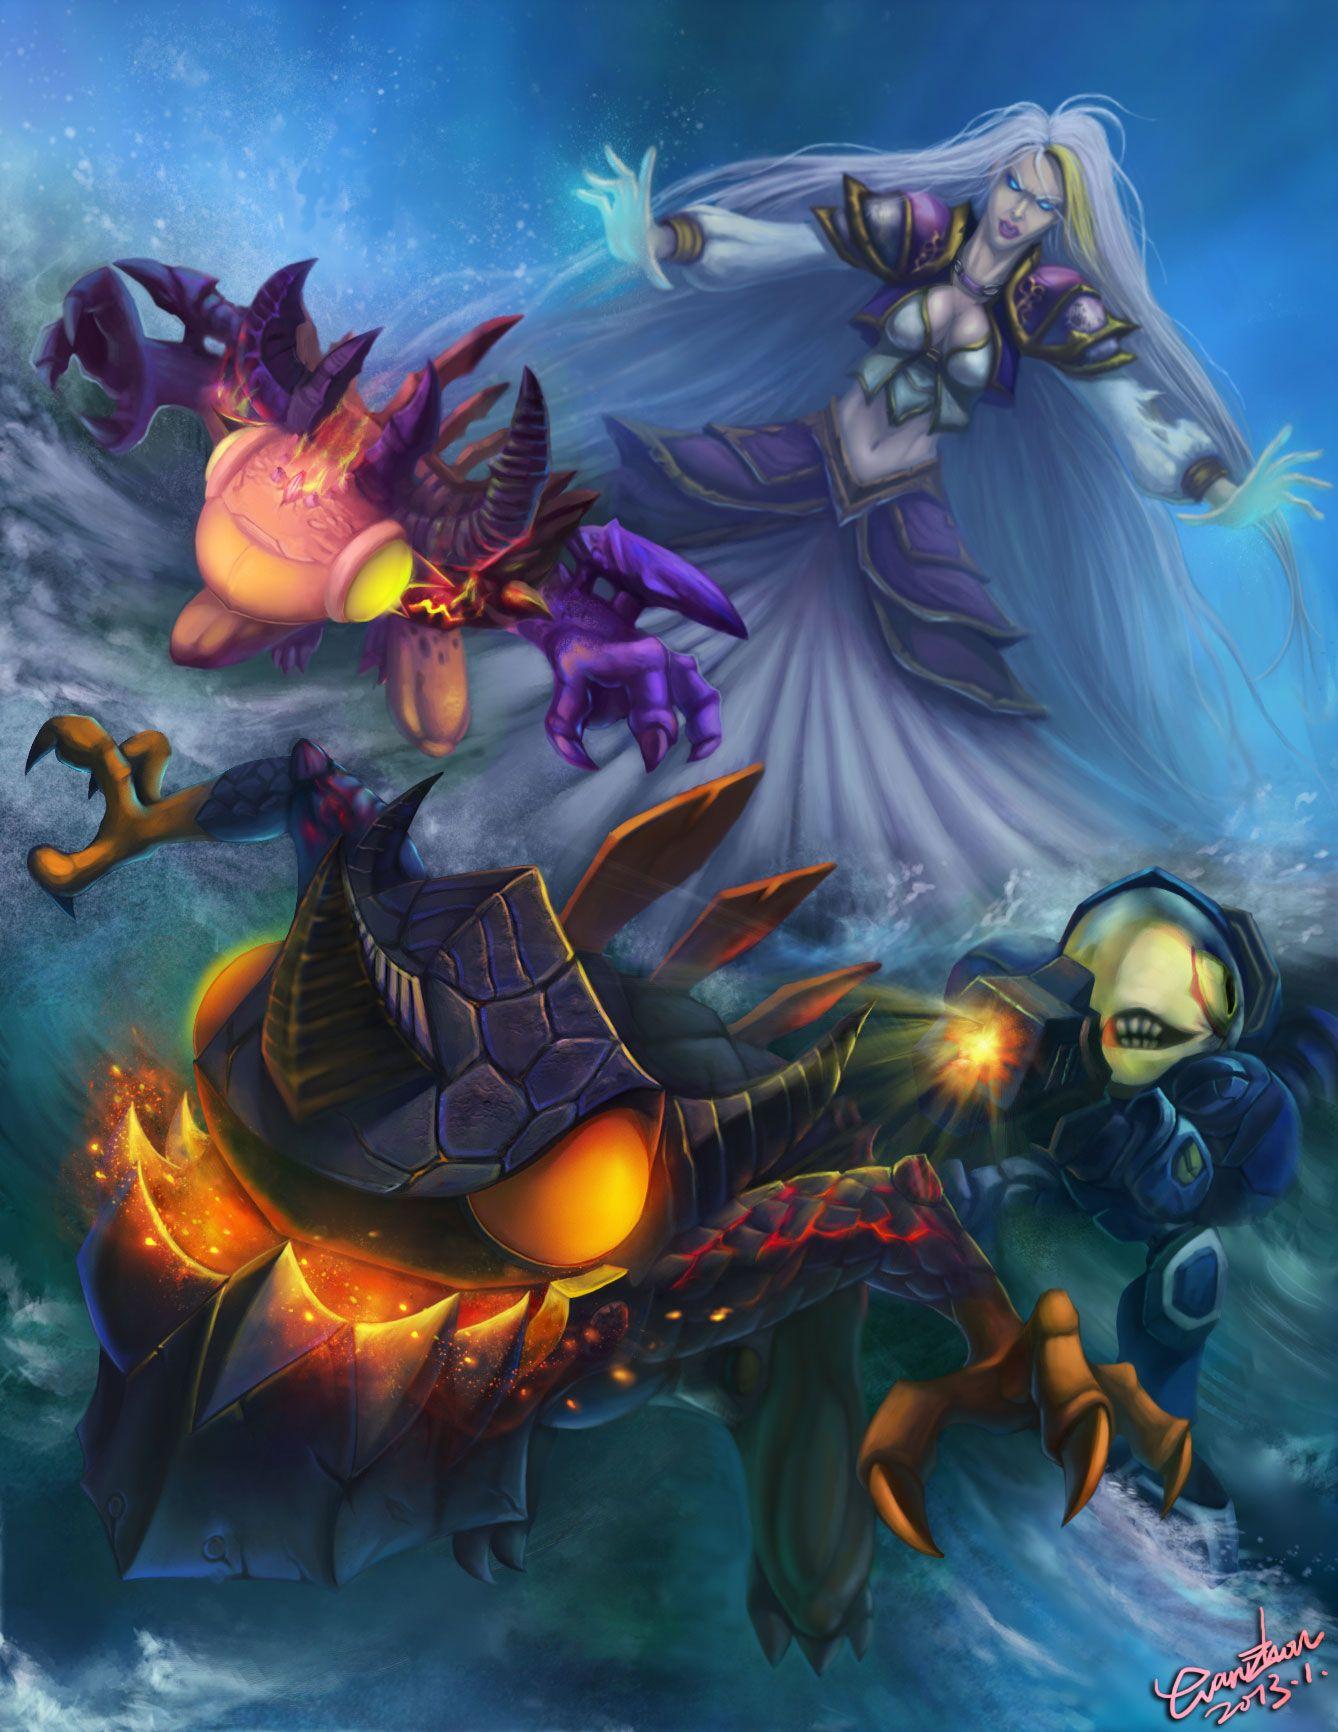 Secret Weapon World of warcraft, Anime, Warcraft